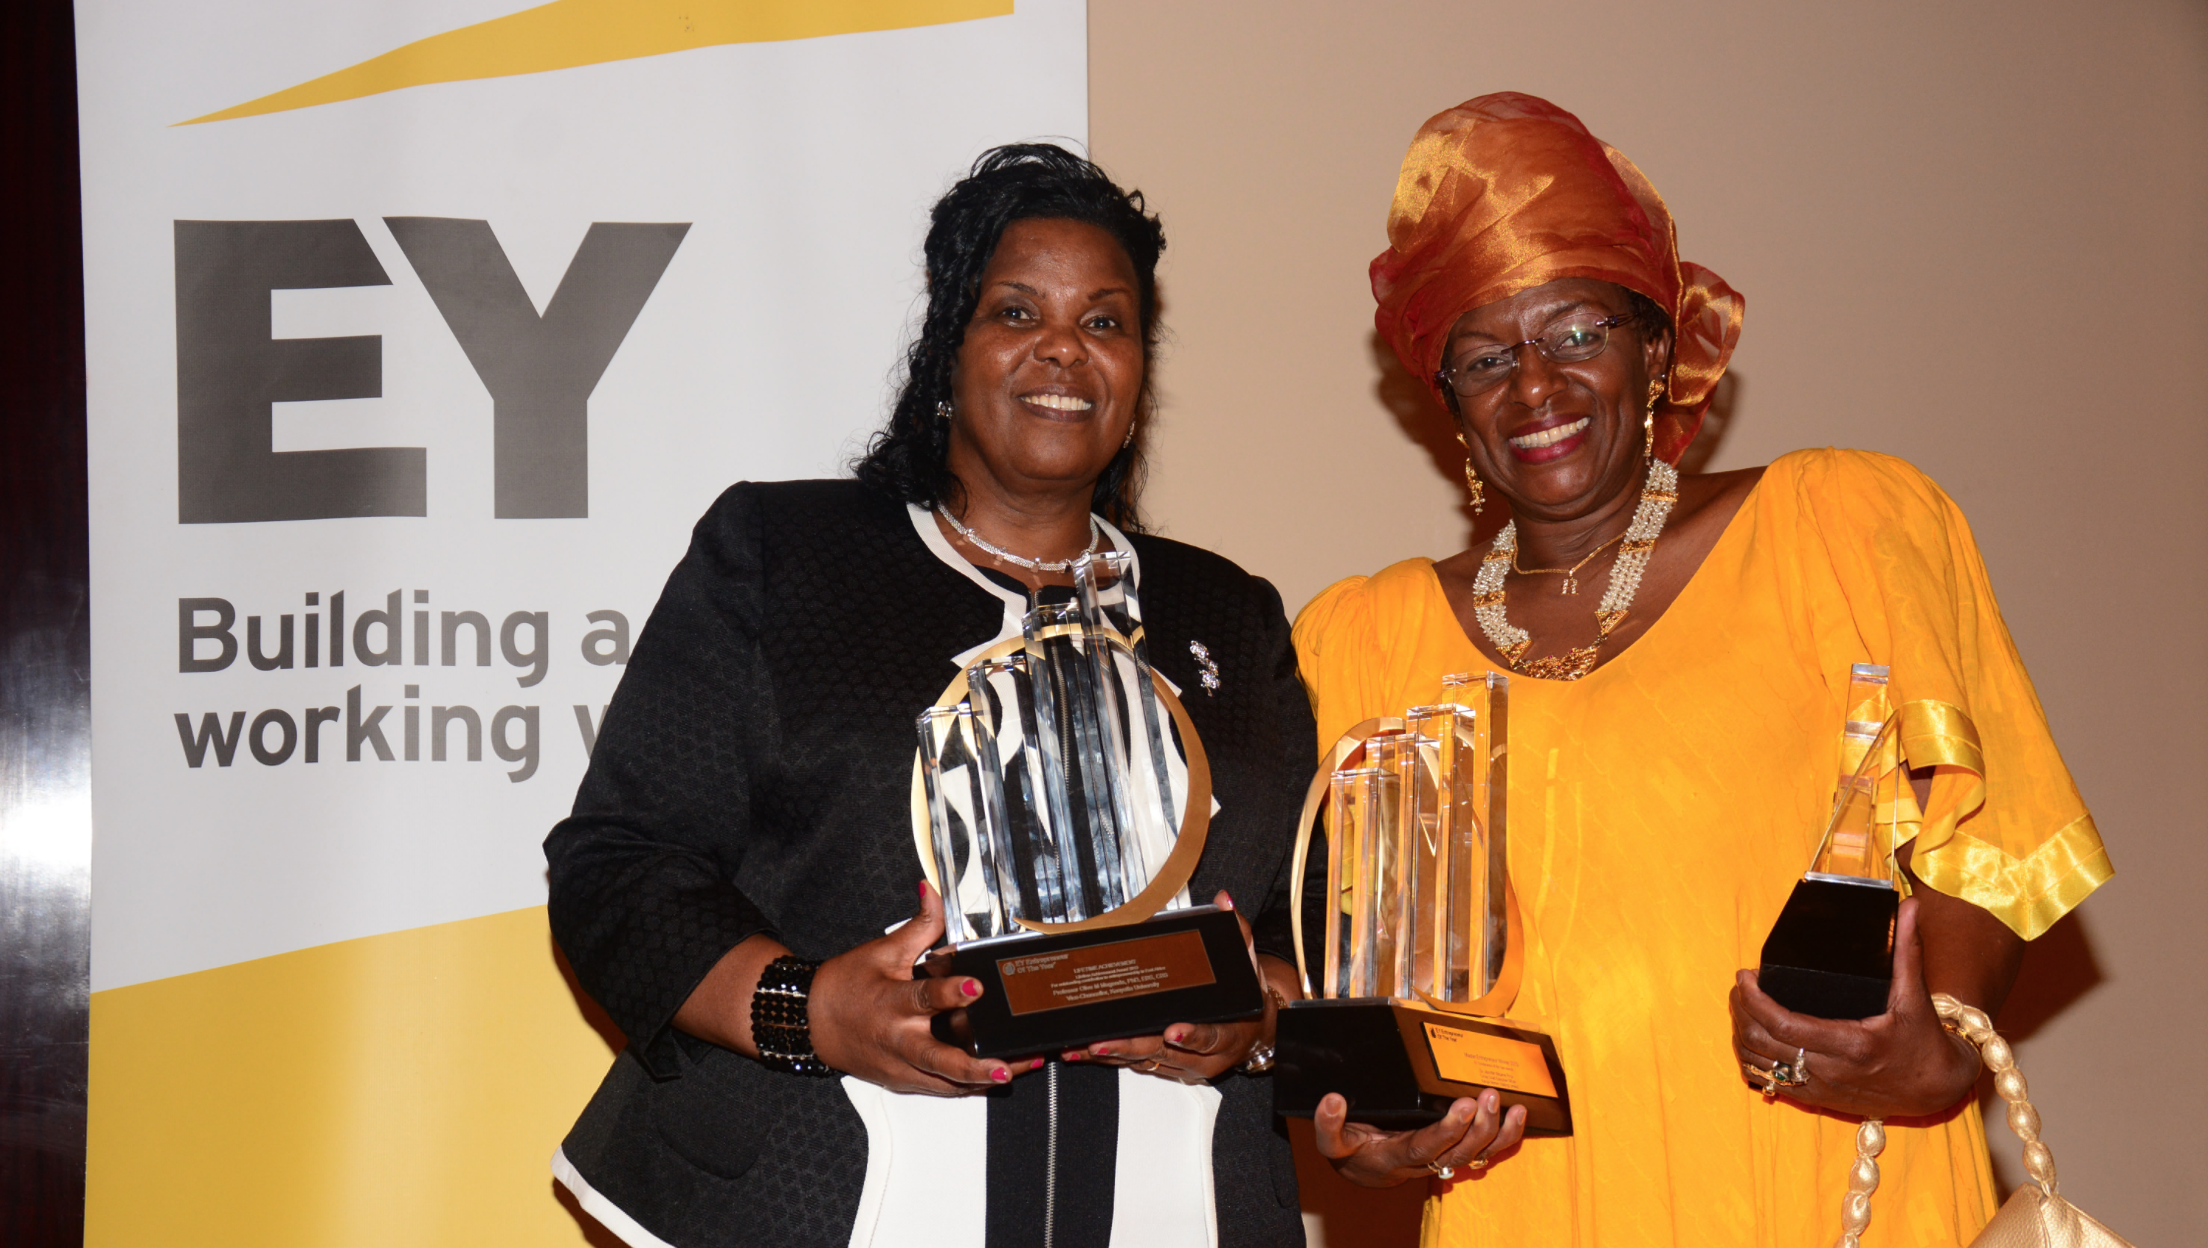 Dr. Jennifer Riria  (Right), founder & group chief executive of Kenya Women Holding